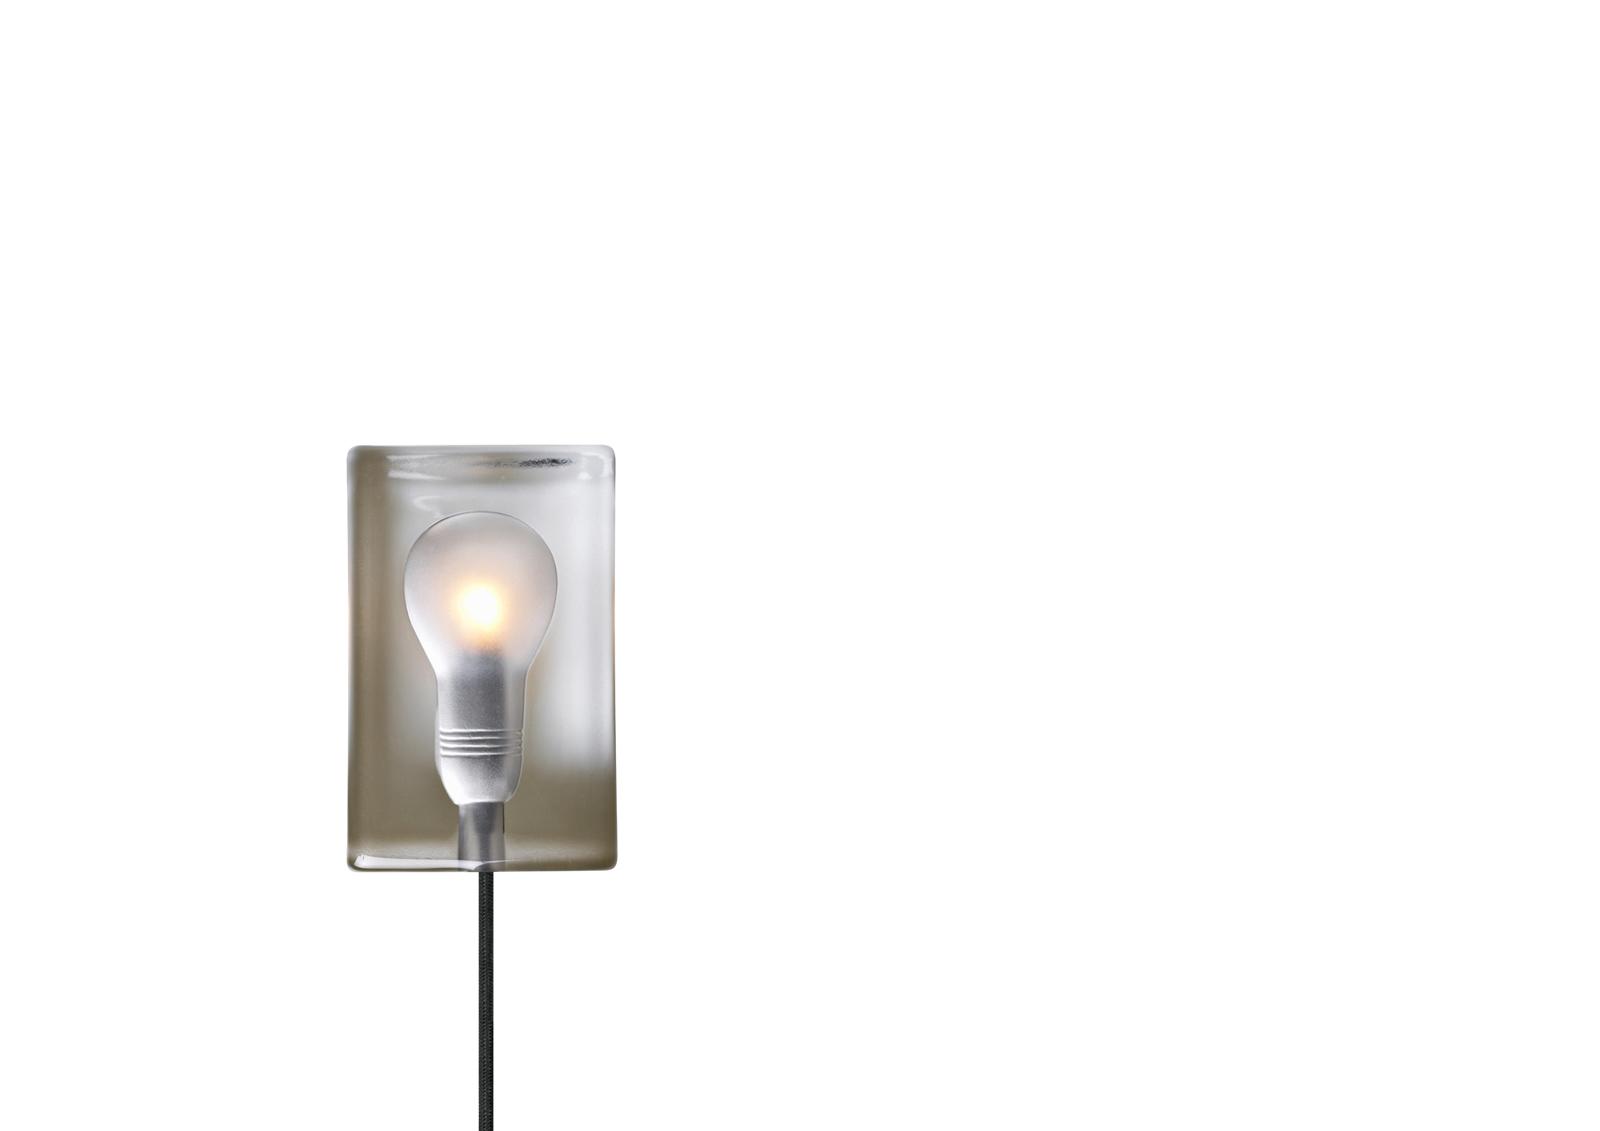 block lamp photo - 9